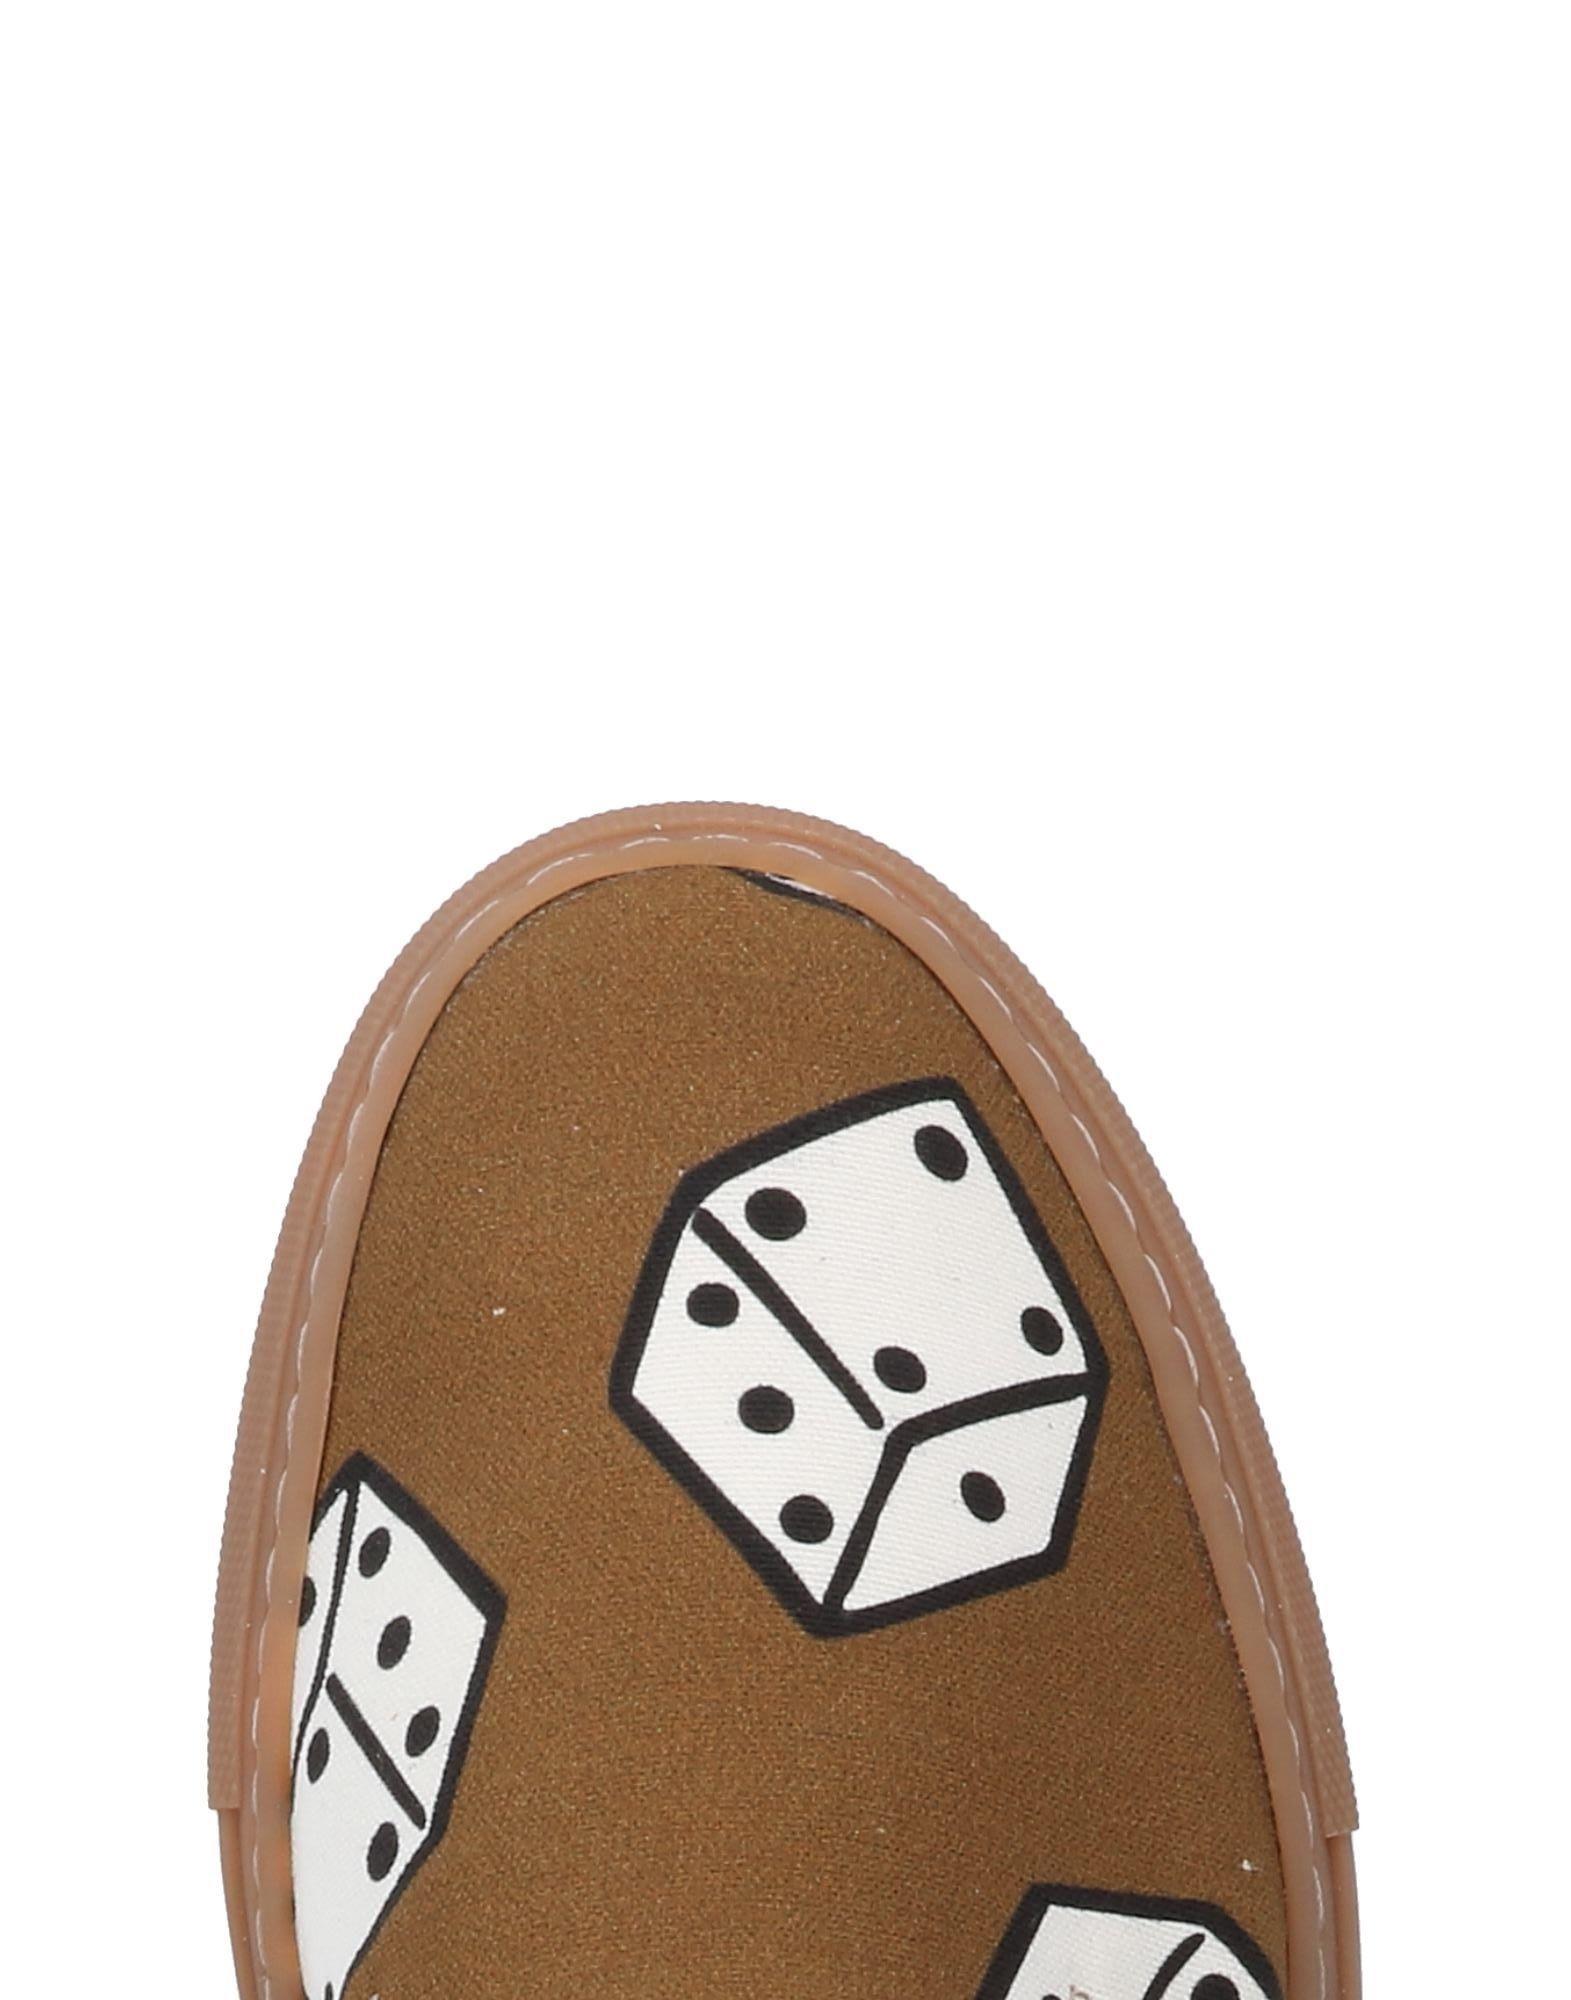 Msgm Sneakers 11494947KH Herren  11494947KH Sneakers Heiße Schuhe 28caaf